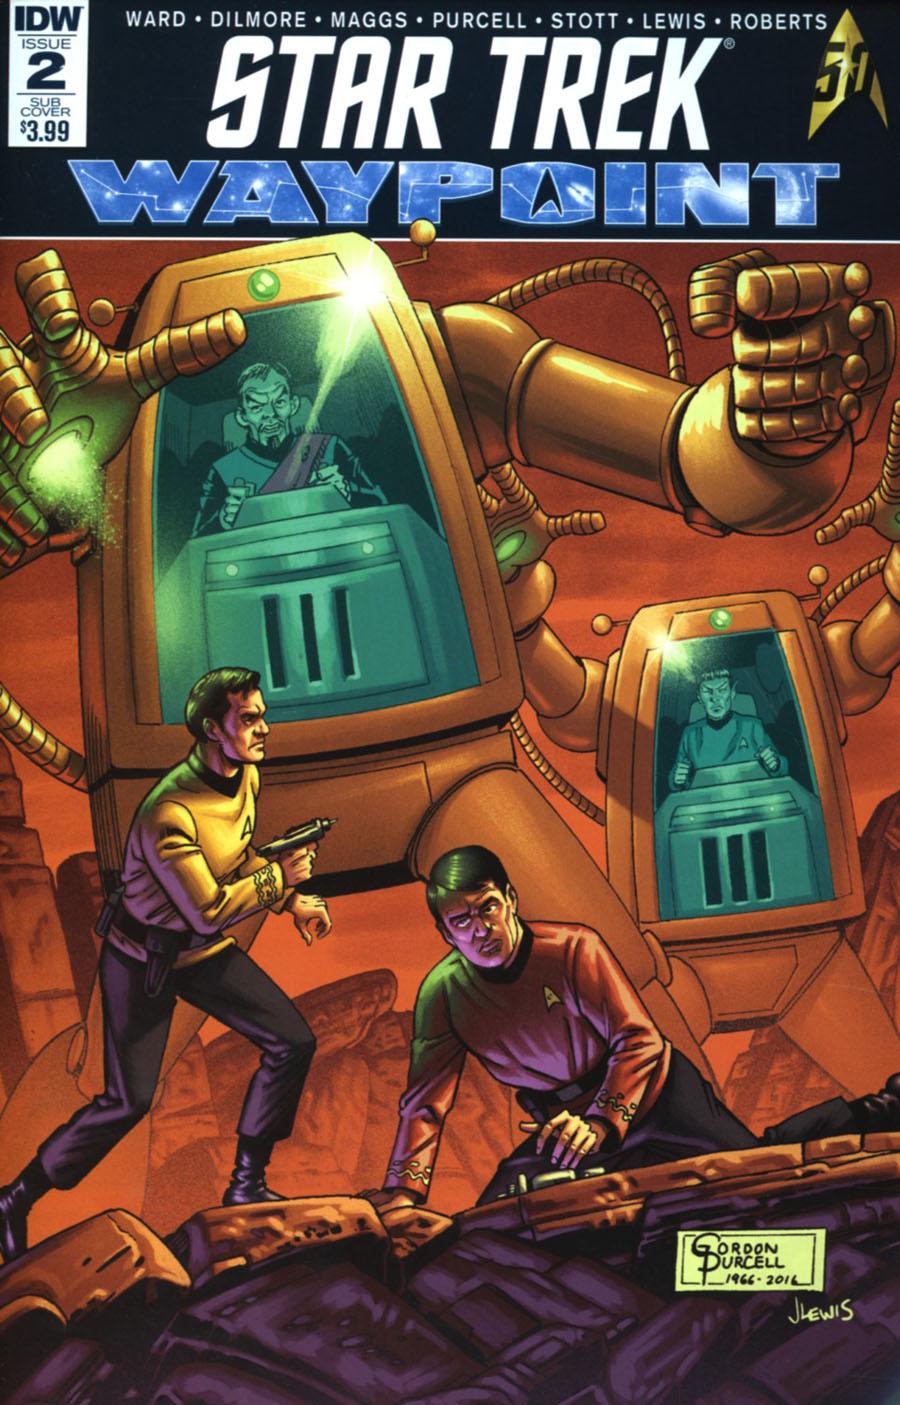 Star Trek Waypoint #2 Cover B Variant Gordon Purcell Subscription Cover